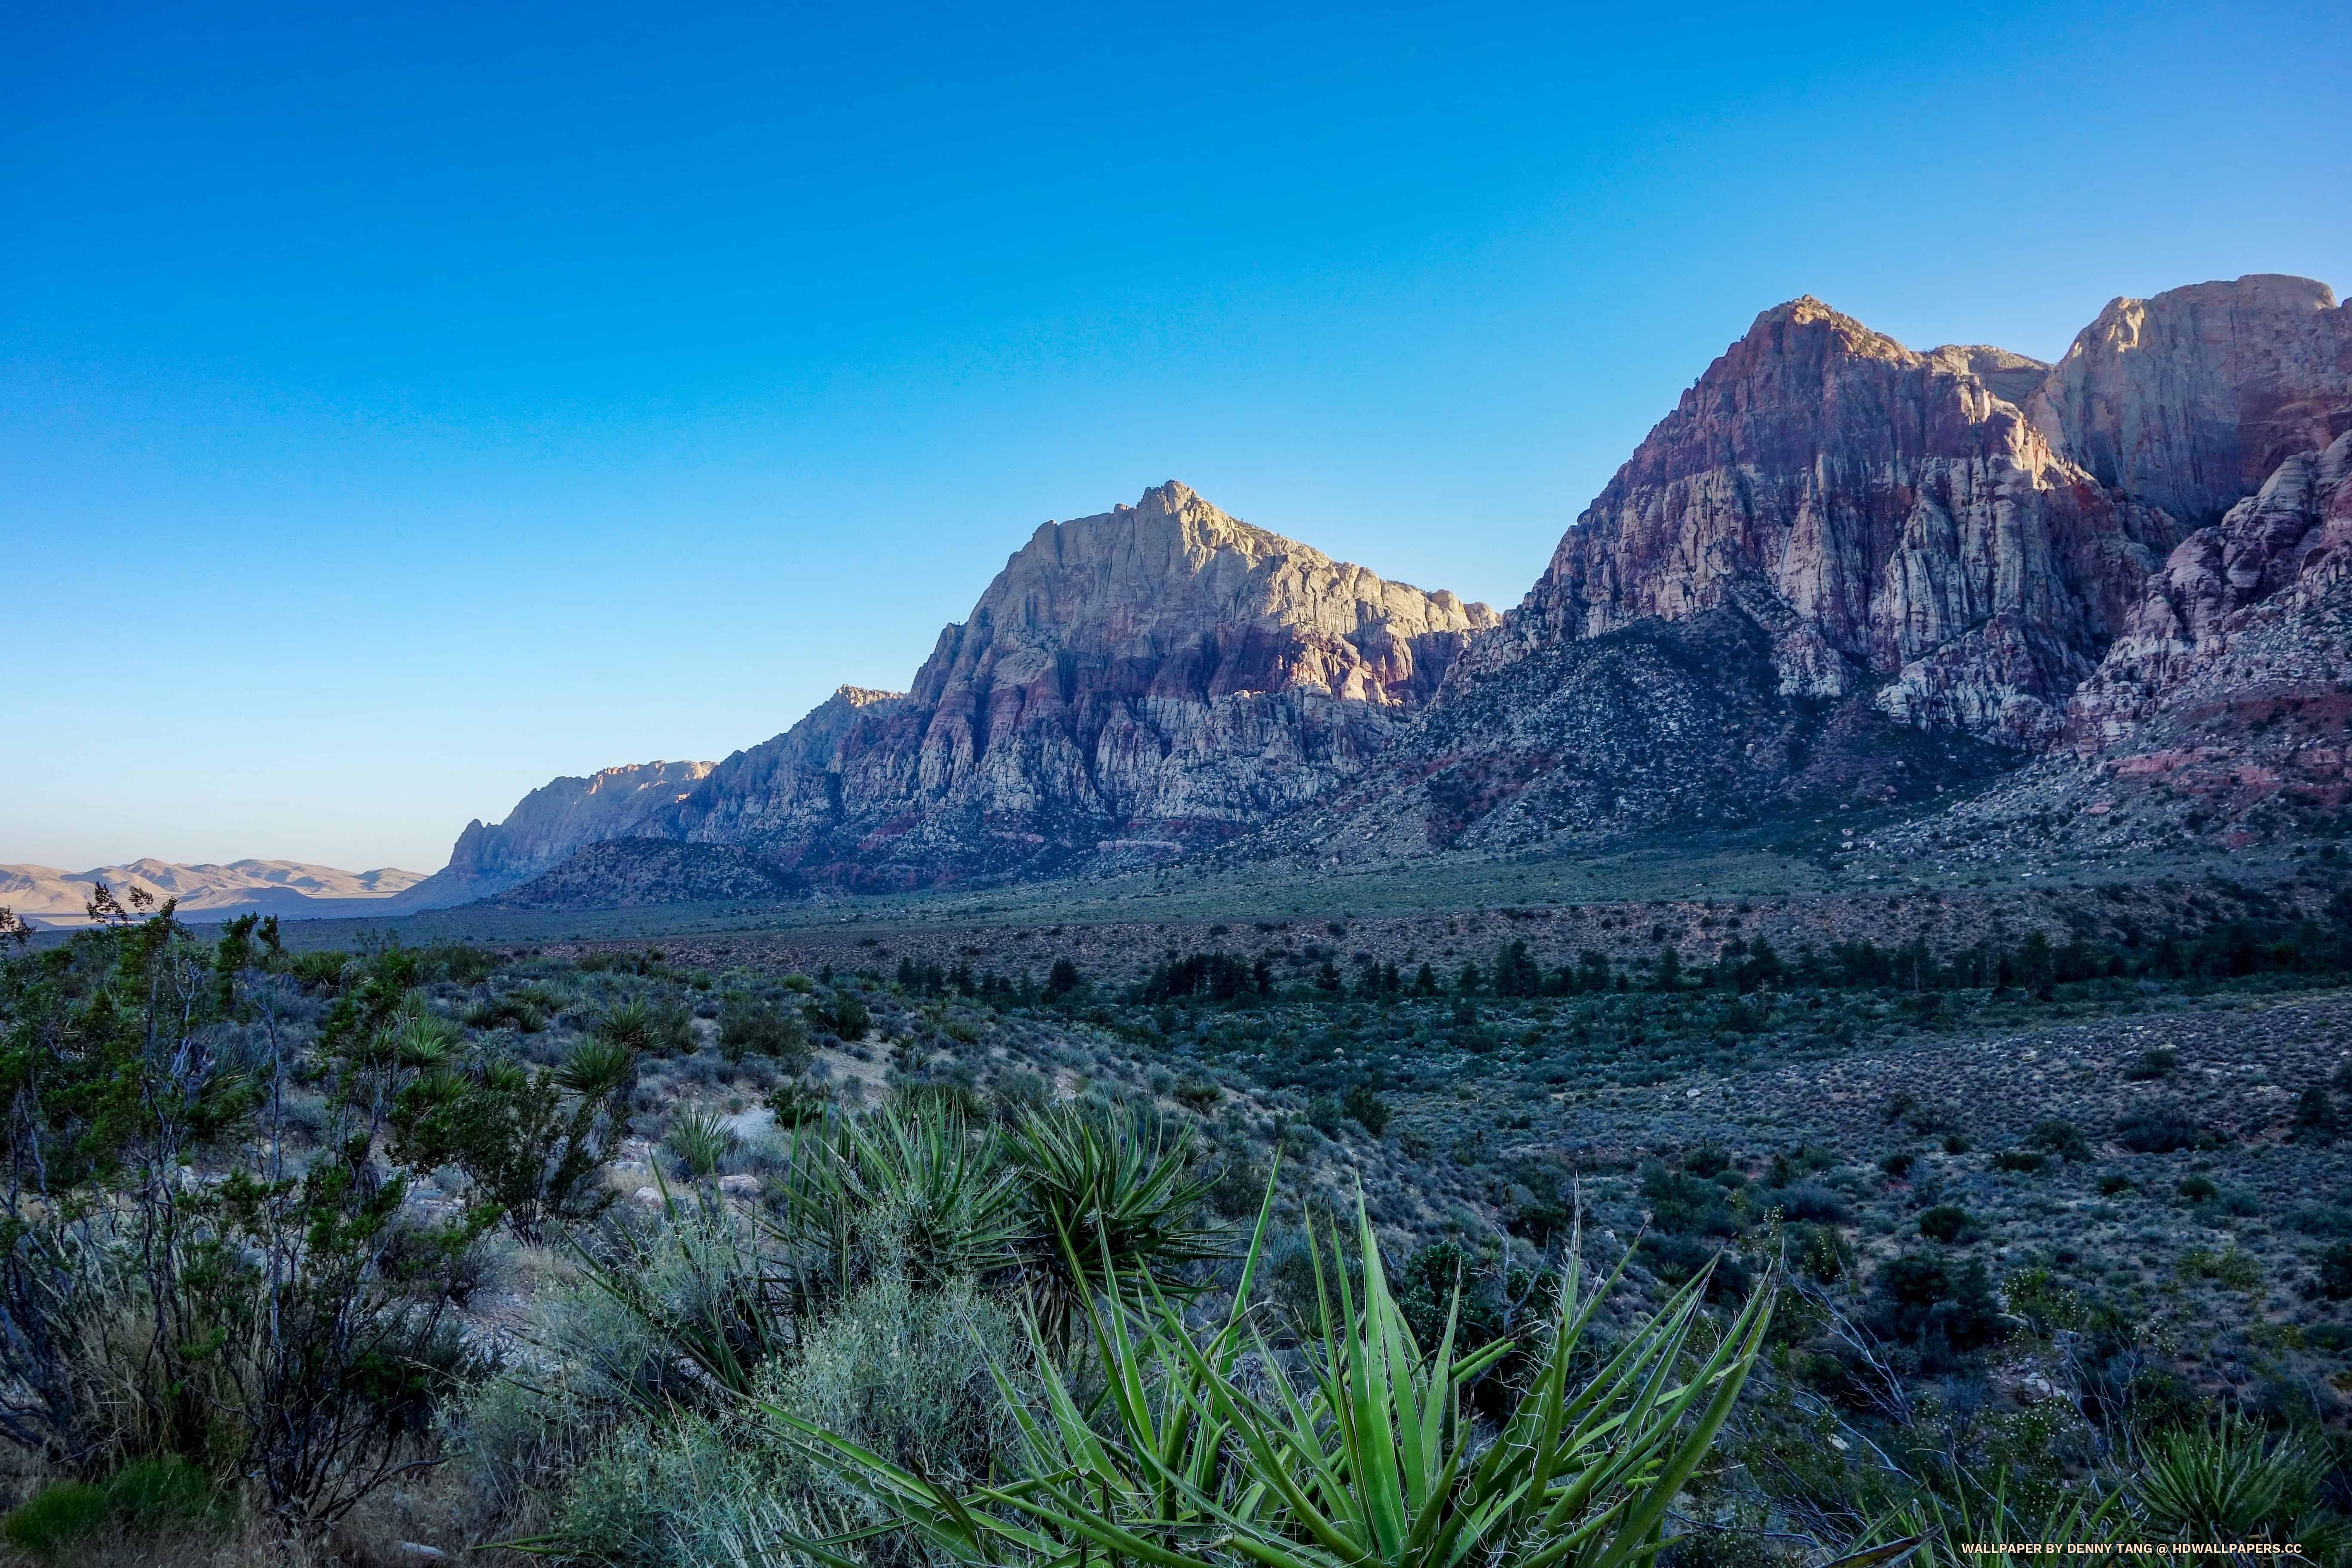 Simple Wallpaper Mountain 1440p - red-rock-canyon-landscape  Gallery_801392.jpg?fit\u003d3840%2C2560\u0026ssl\u003d1